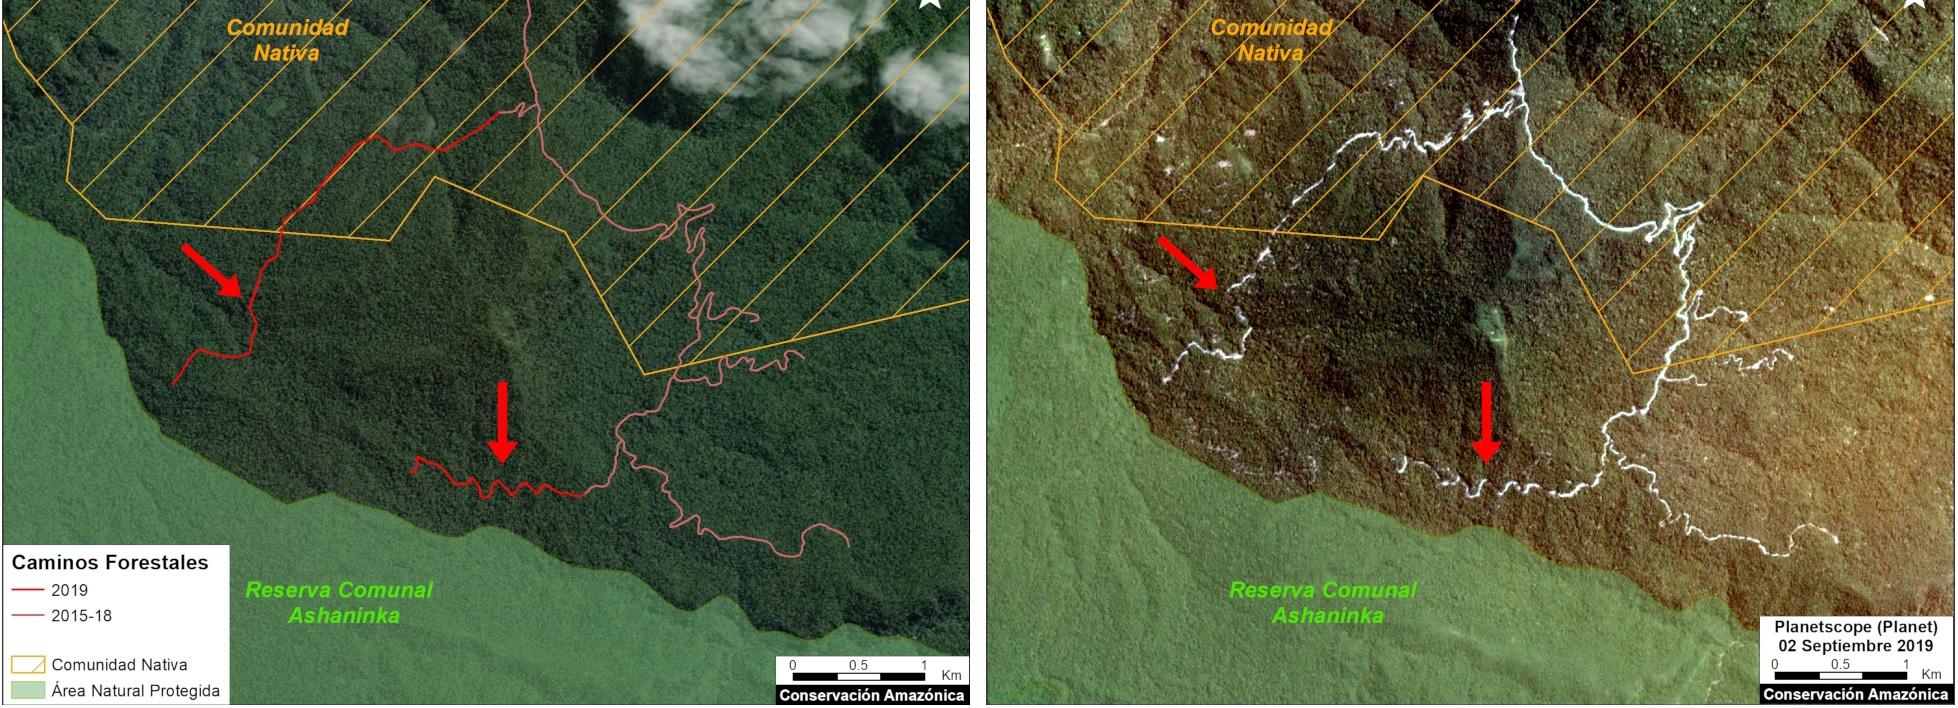 Camino Forestal Reserva Comunal Asháninka MAAP